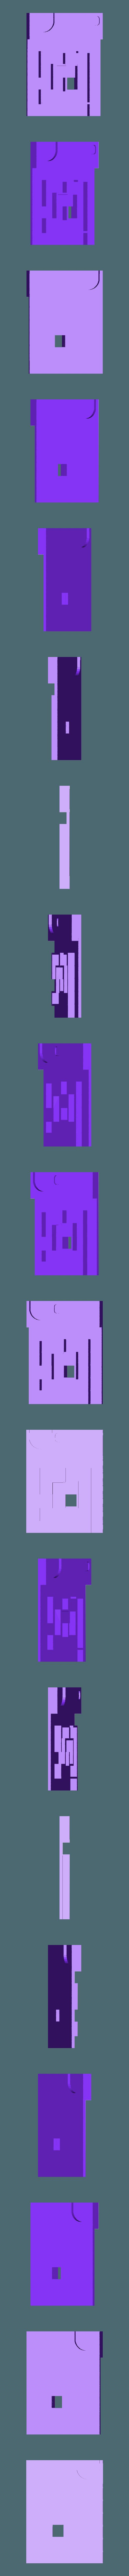 Game Card_CIRCLE MAZE.stl Download free STL file MARBLE BOY automat • 3D printer object, Janis_Bruchwalski